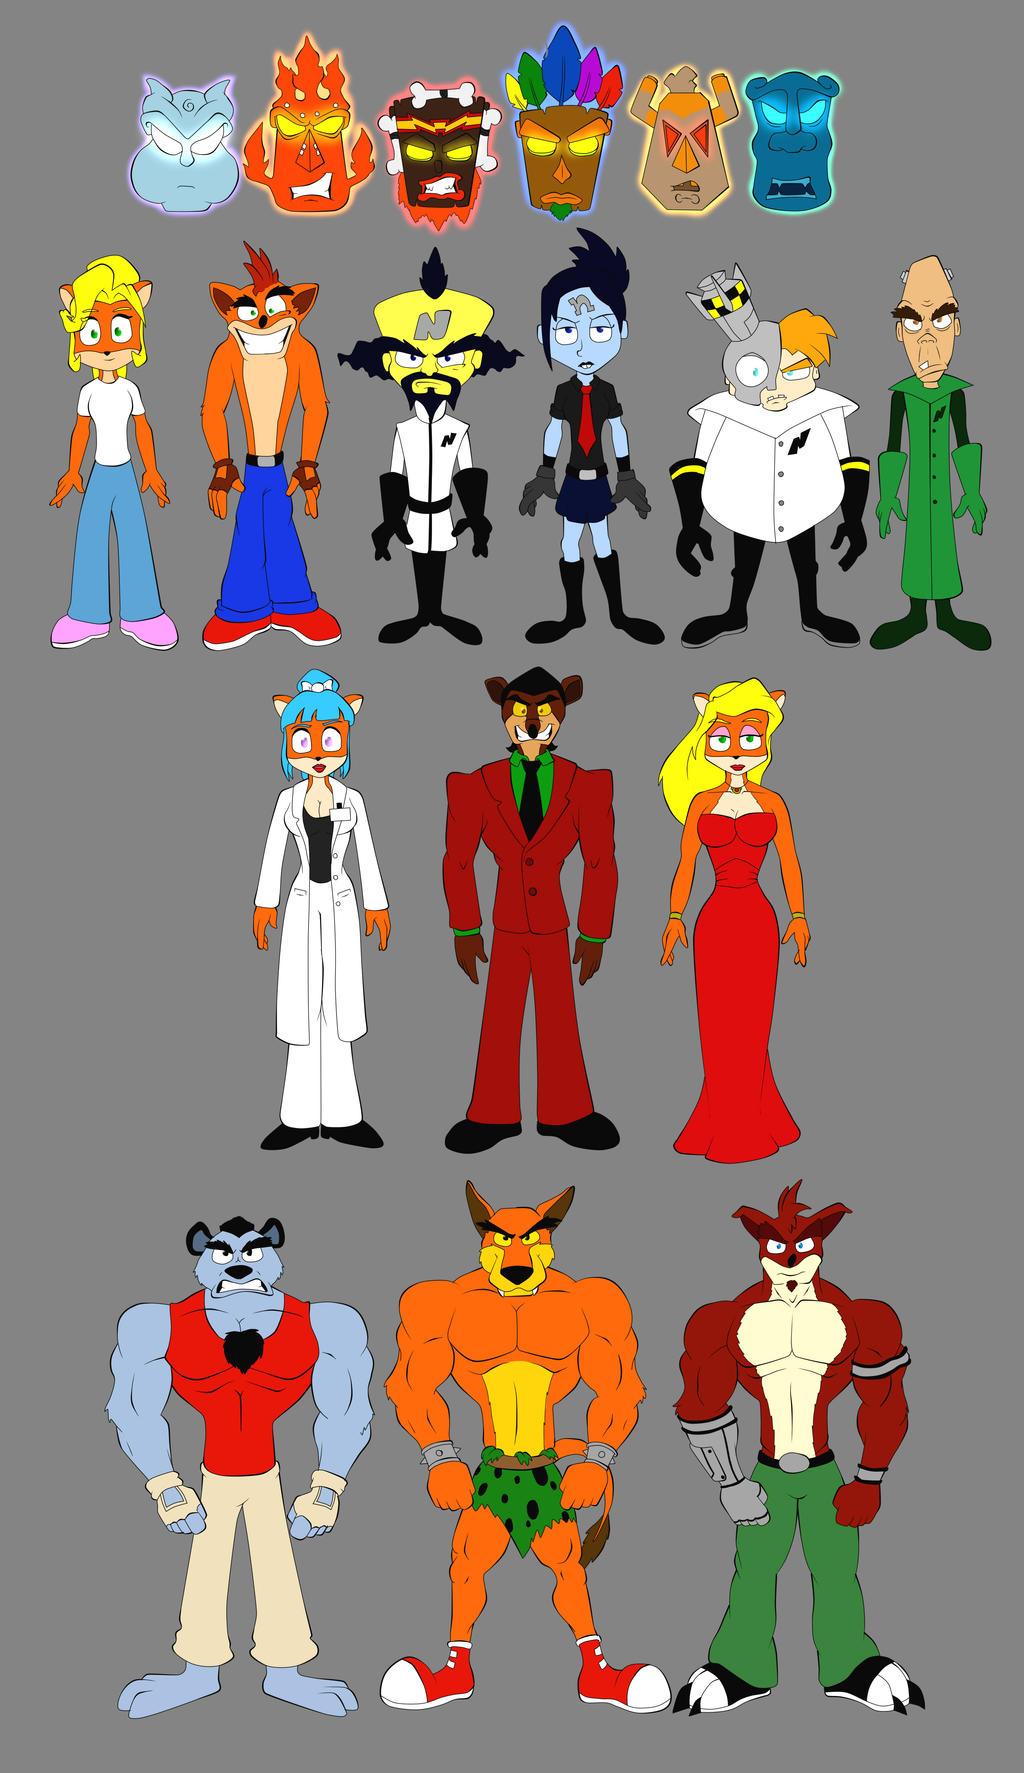 Crash bandicoot many characters by DSA09 on DeviantArt